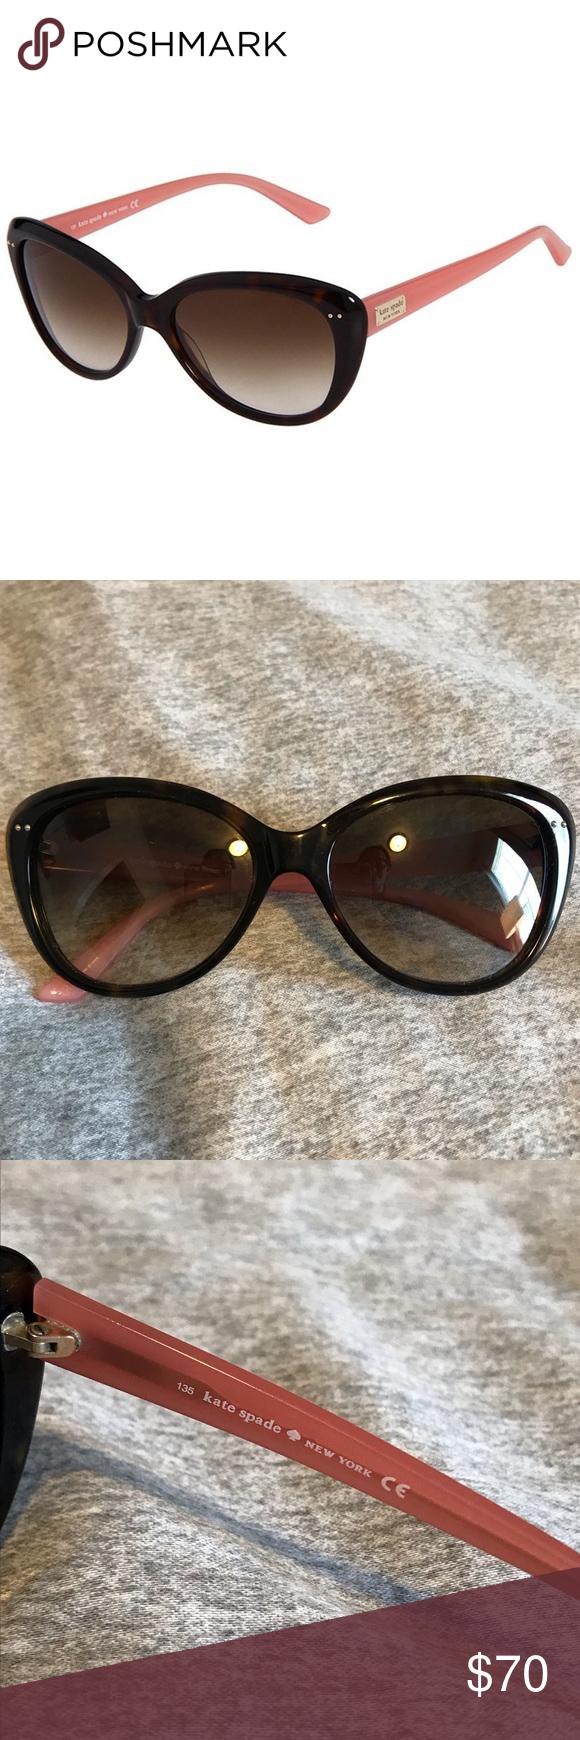 1e7ca5f53fbe Kate Spade Angelique Sunglasses Kate Spade Angelique Cat Eye Sunglasses Pink  In great condition!